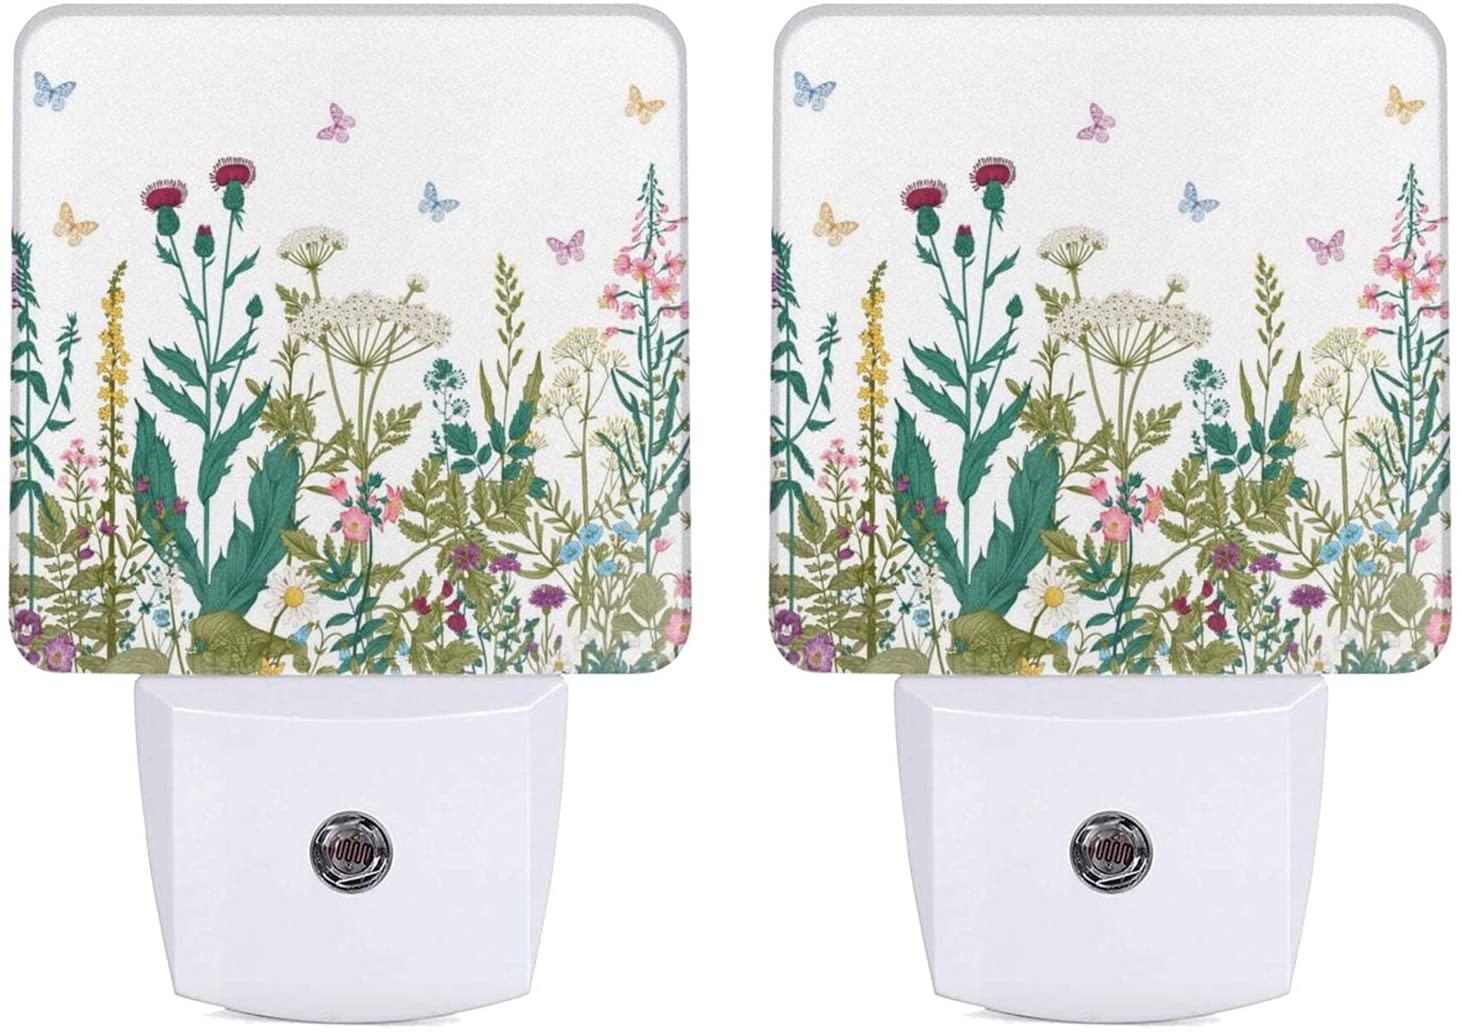 2 PCS Night Light Vintage Floral Night Light Lamp Plug-in LED Nightlights Flower Auto Dusk-to-Dawn Sensor Lamp for Bedroom Bathroom Kitchen Hallway Stairs